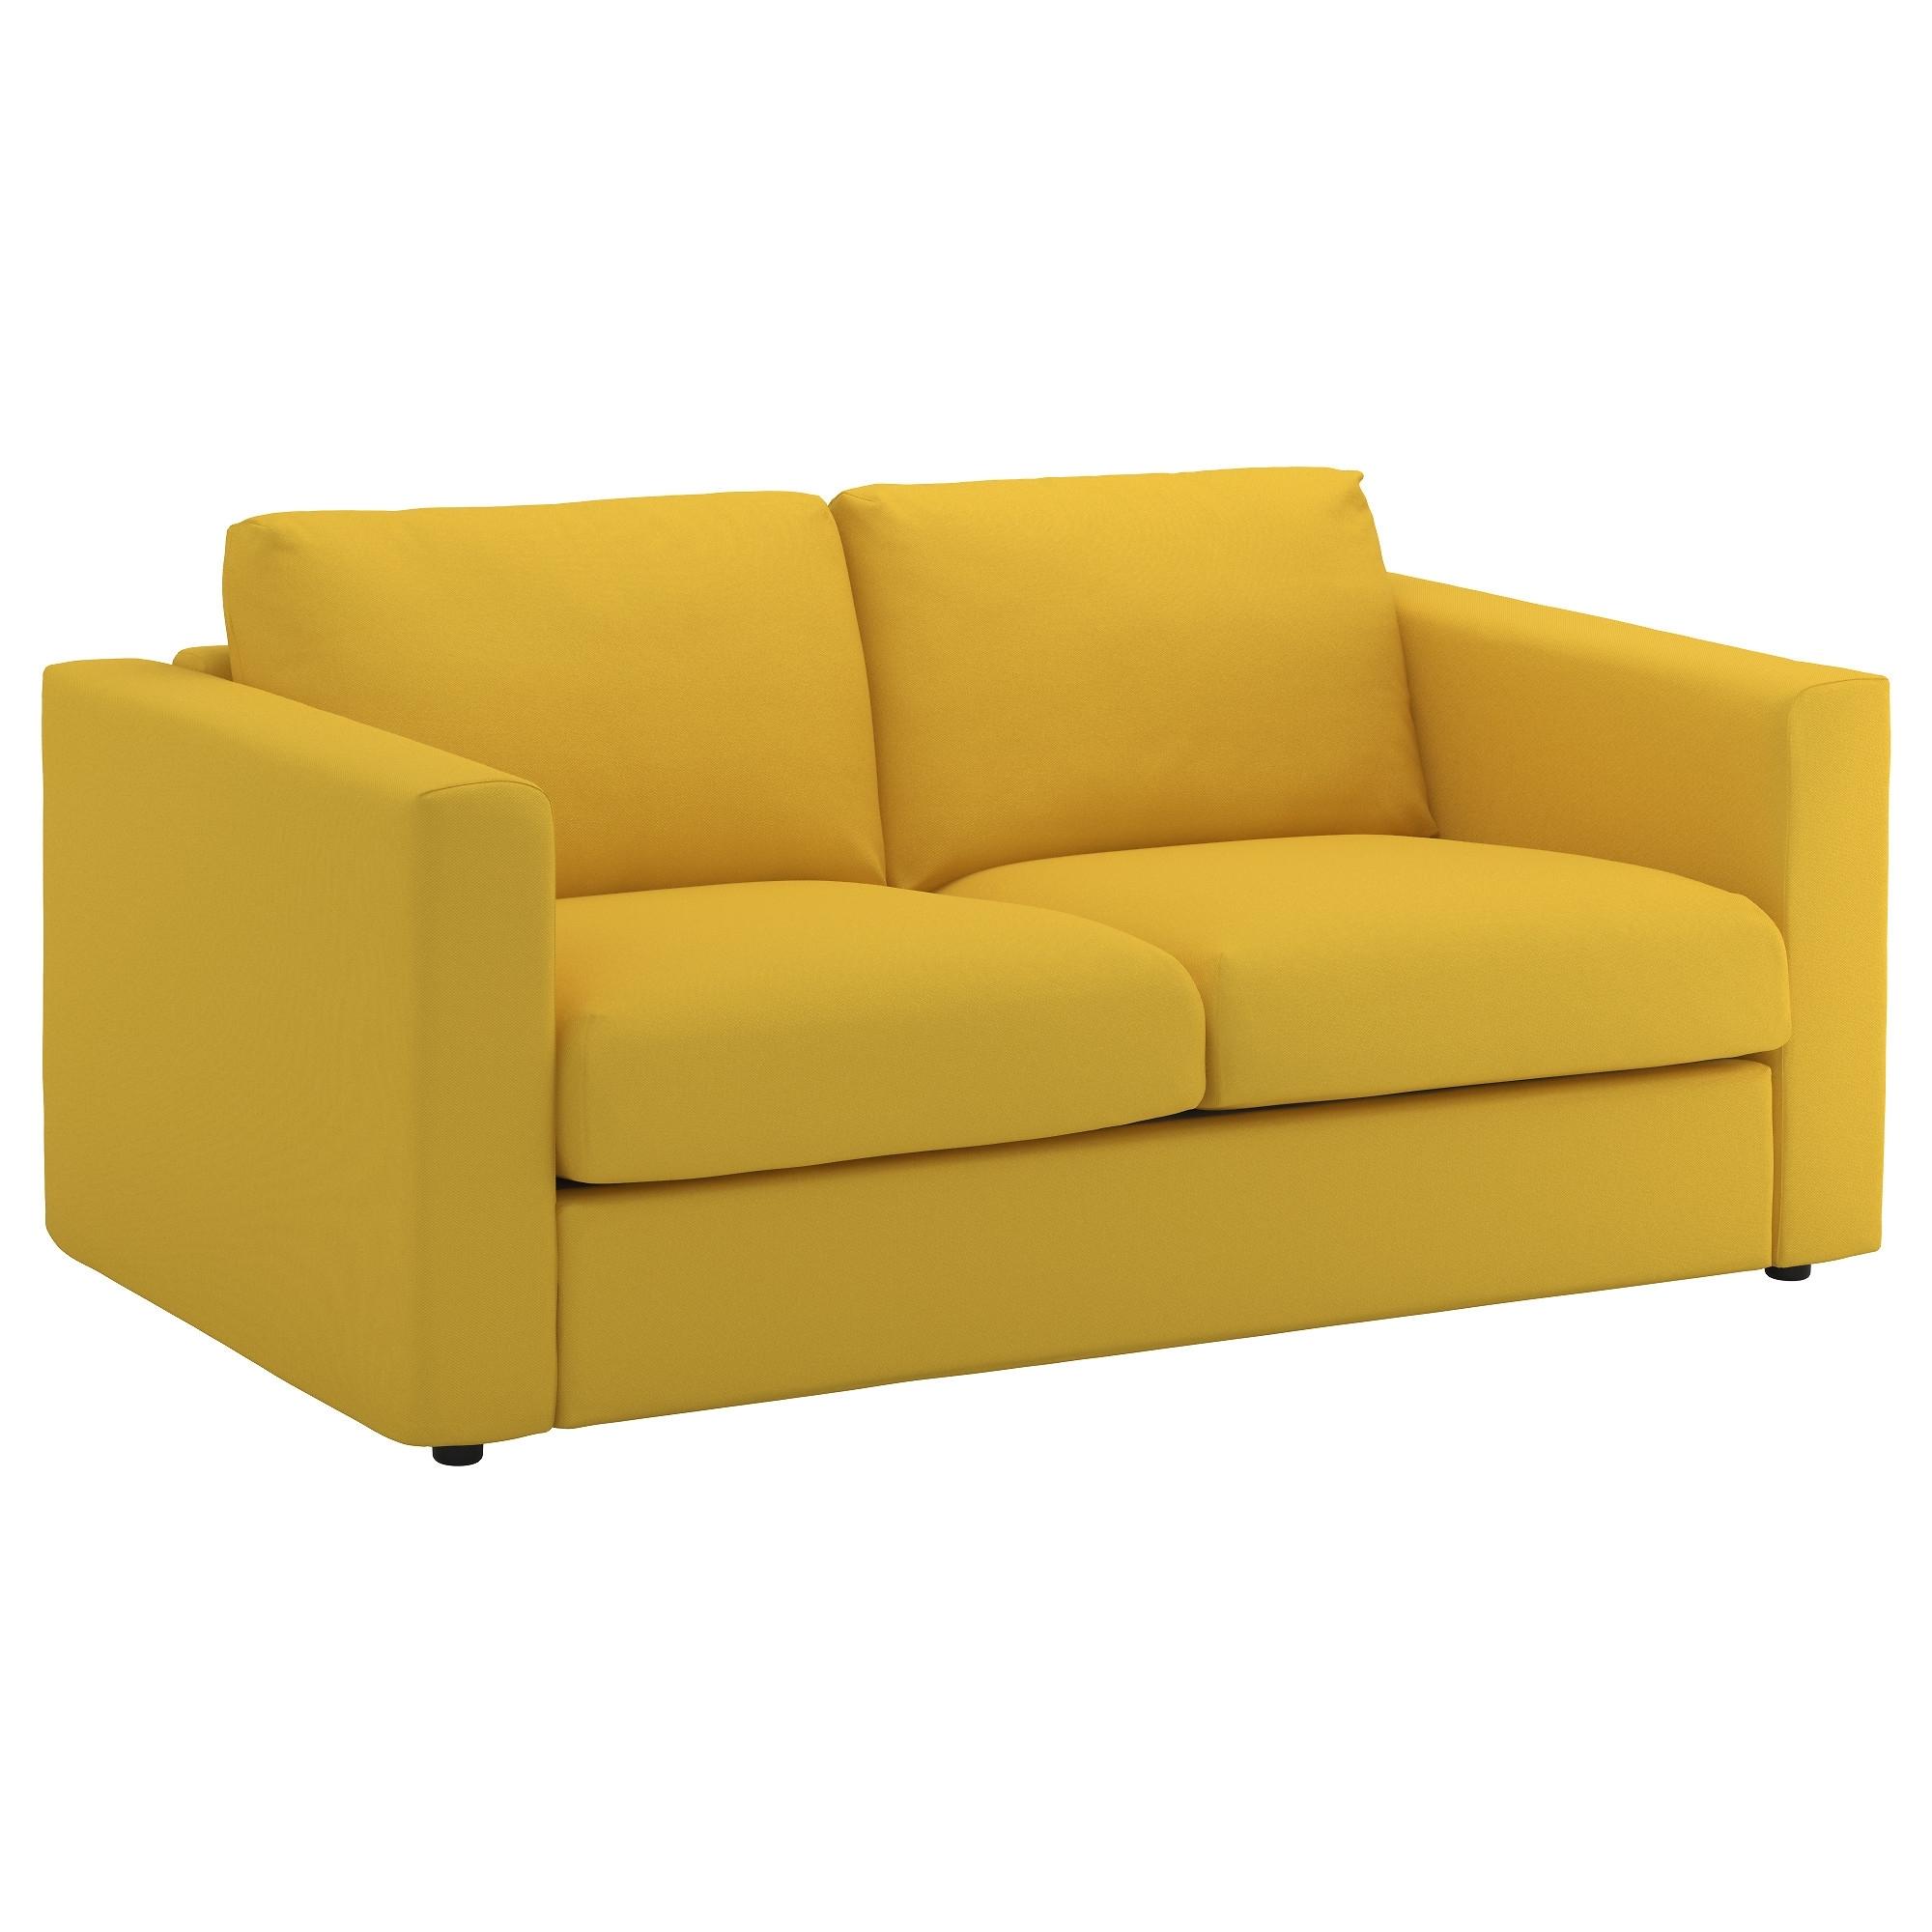 Preferred Ikea Two Seater Sofas Within Vimle 2 Seat Sofa Gräsbo Golden Yellow – Ikea (View 9 of 20)